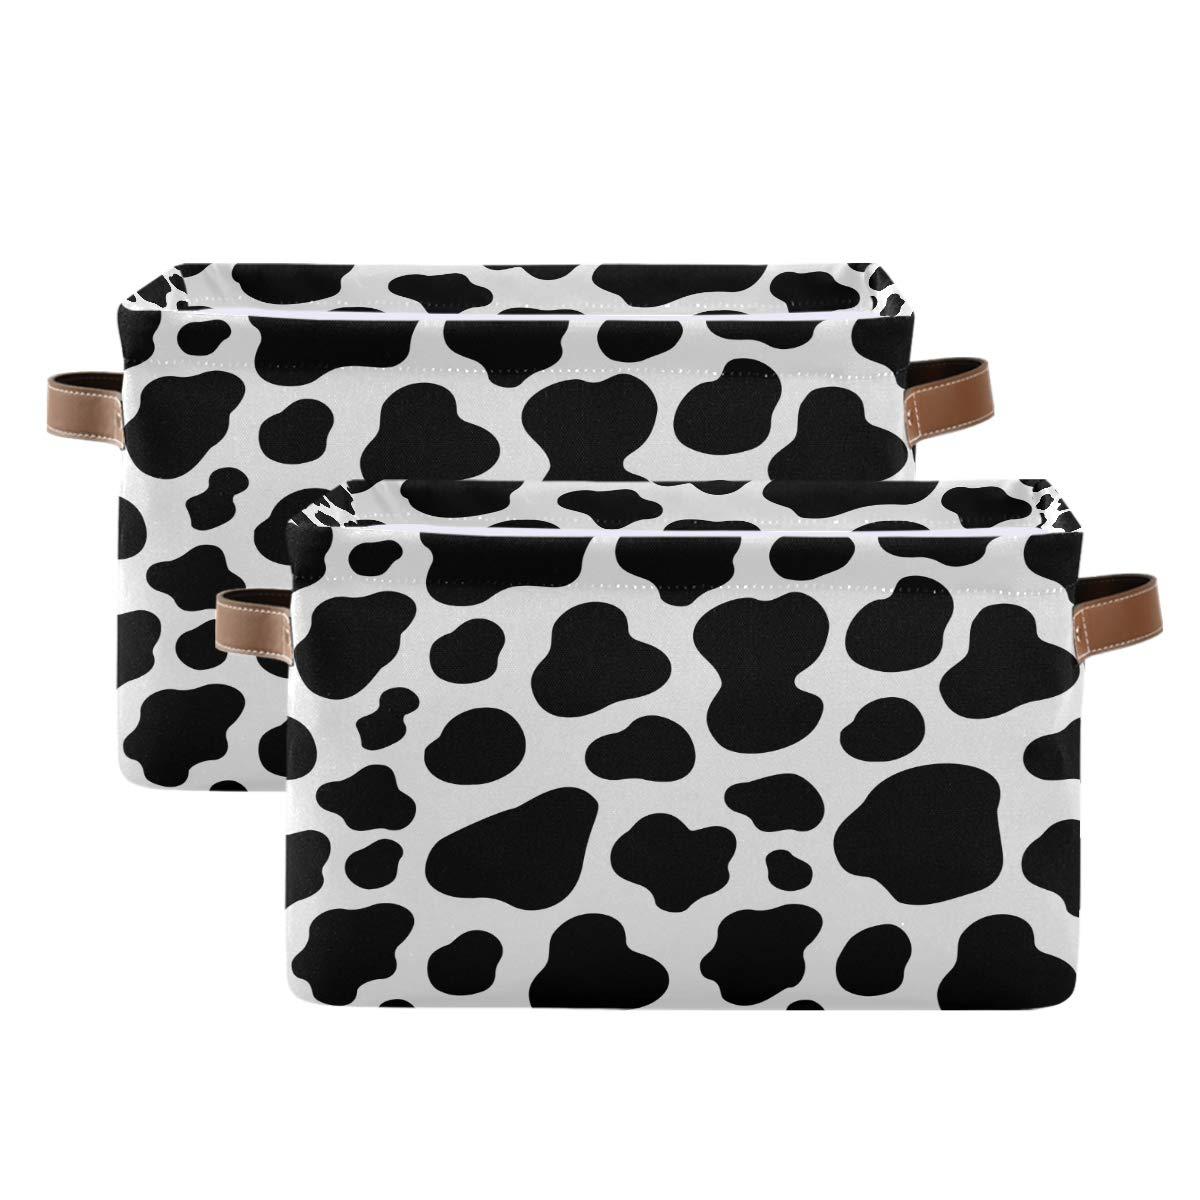 WXLIFE Storage Basket Bins Animal Max 66% Sales for sale OFF Cow Print Pattern Large Storag